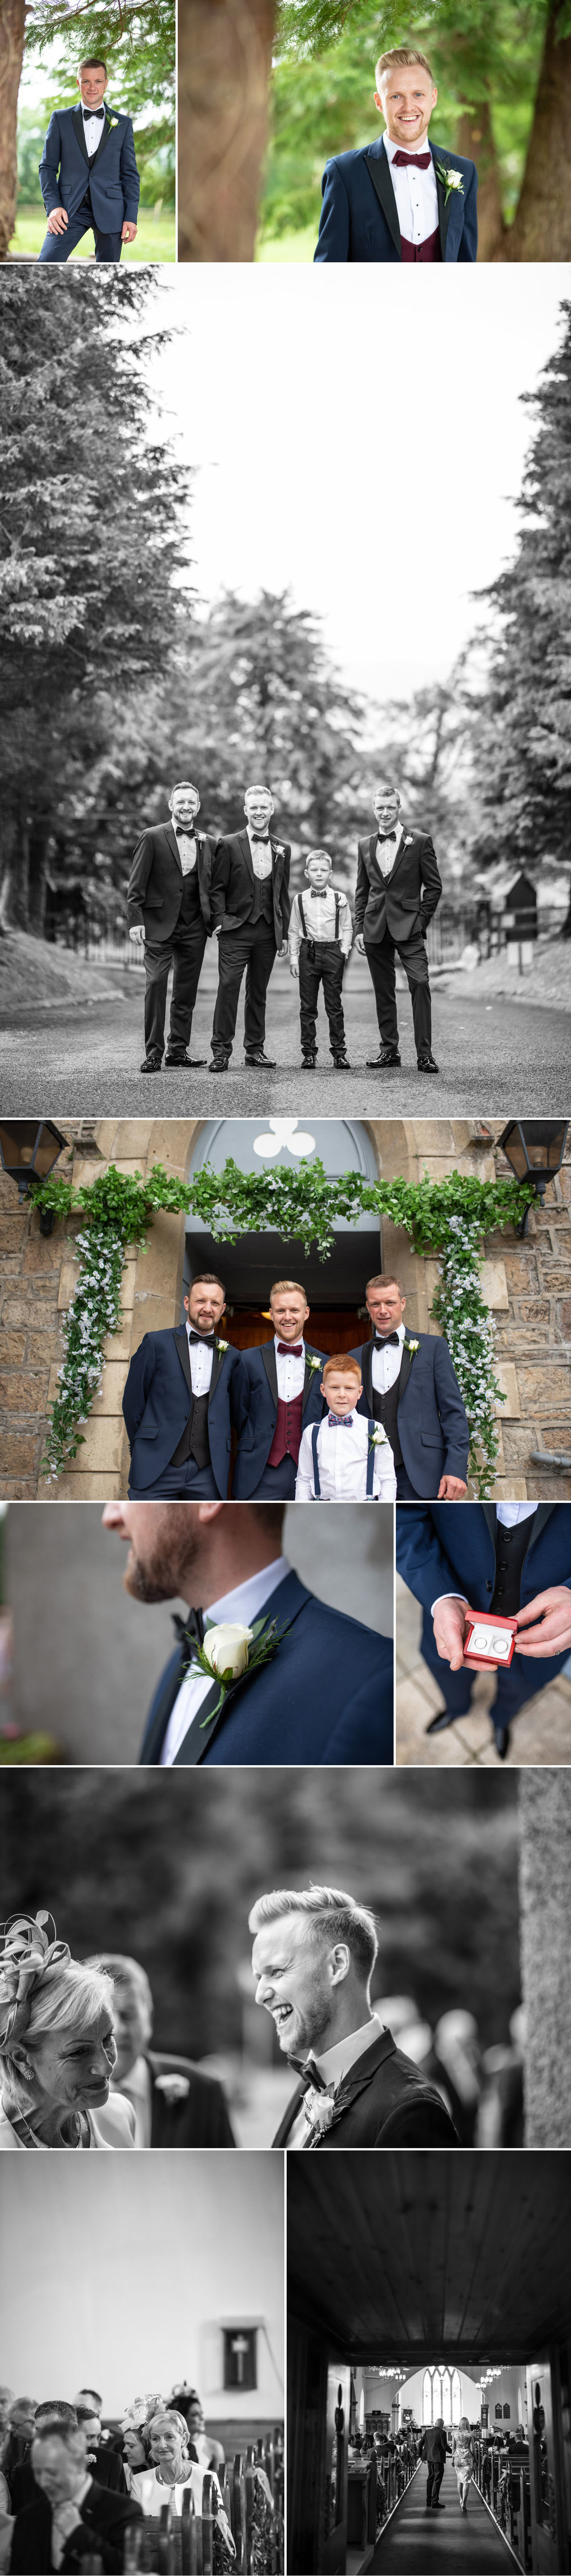 best wedding photographers northern ireland 04.jpg